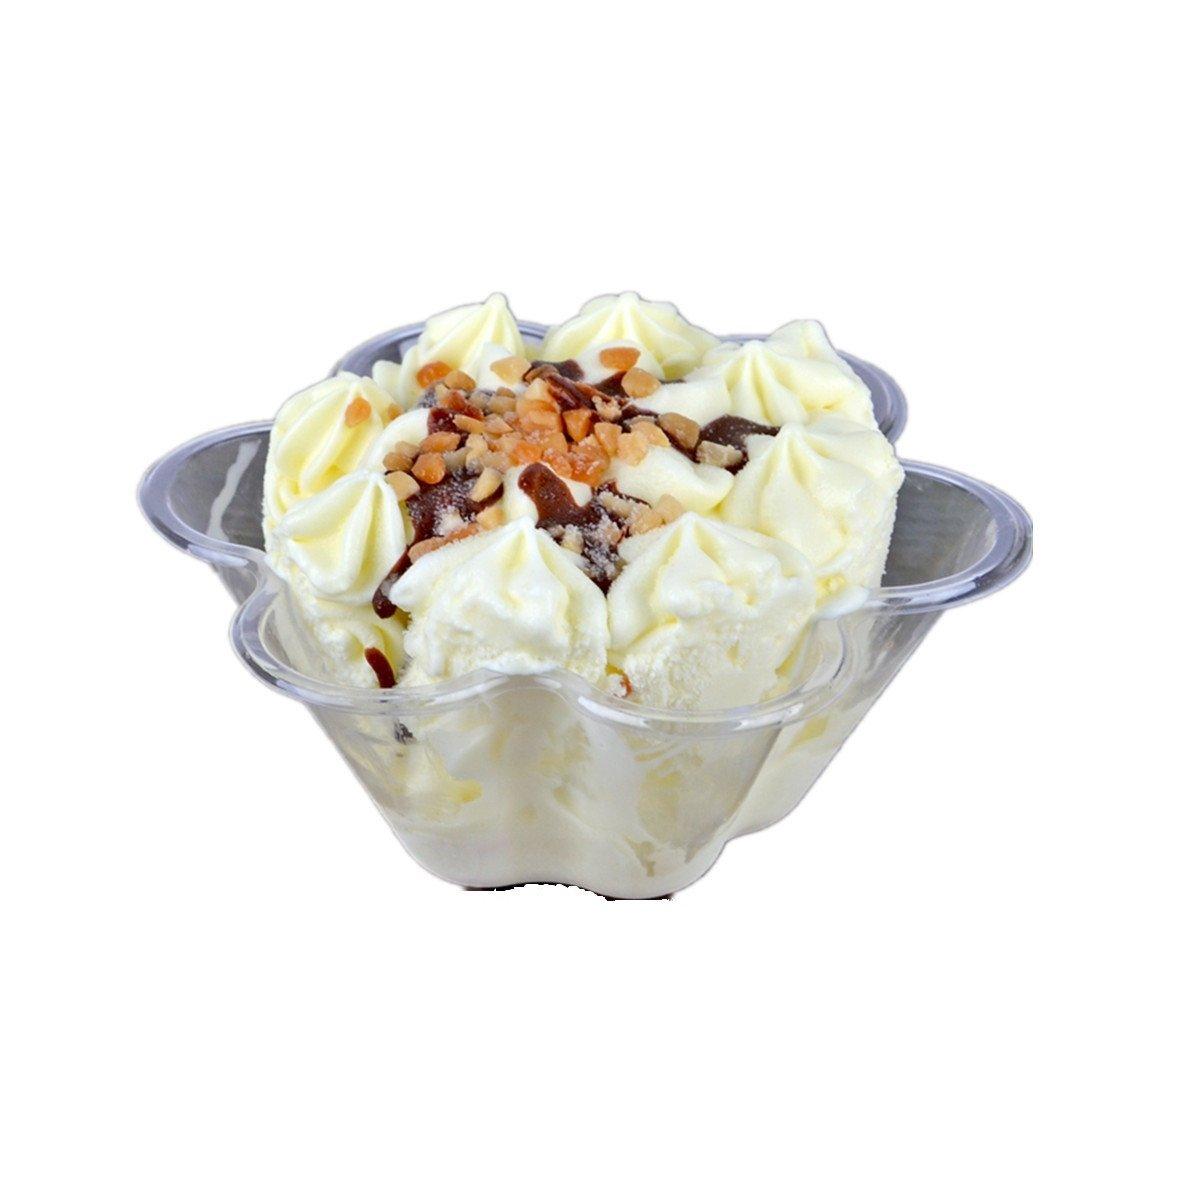 Healthcom 50x Plastic Ice Cream Dessert Bowls Clear Dessert Cups Flower Ice Cream Cup Ice Cream Sundae Bowl